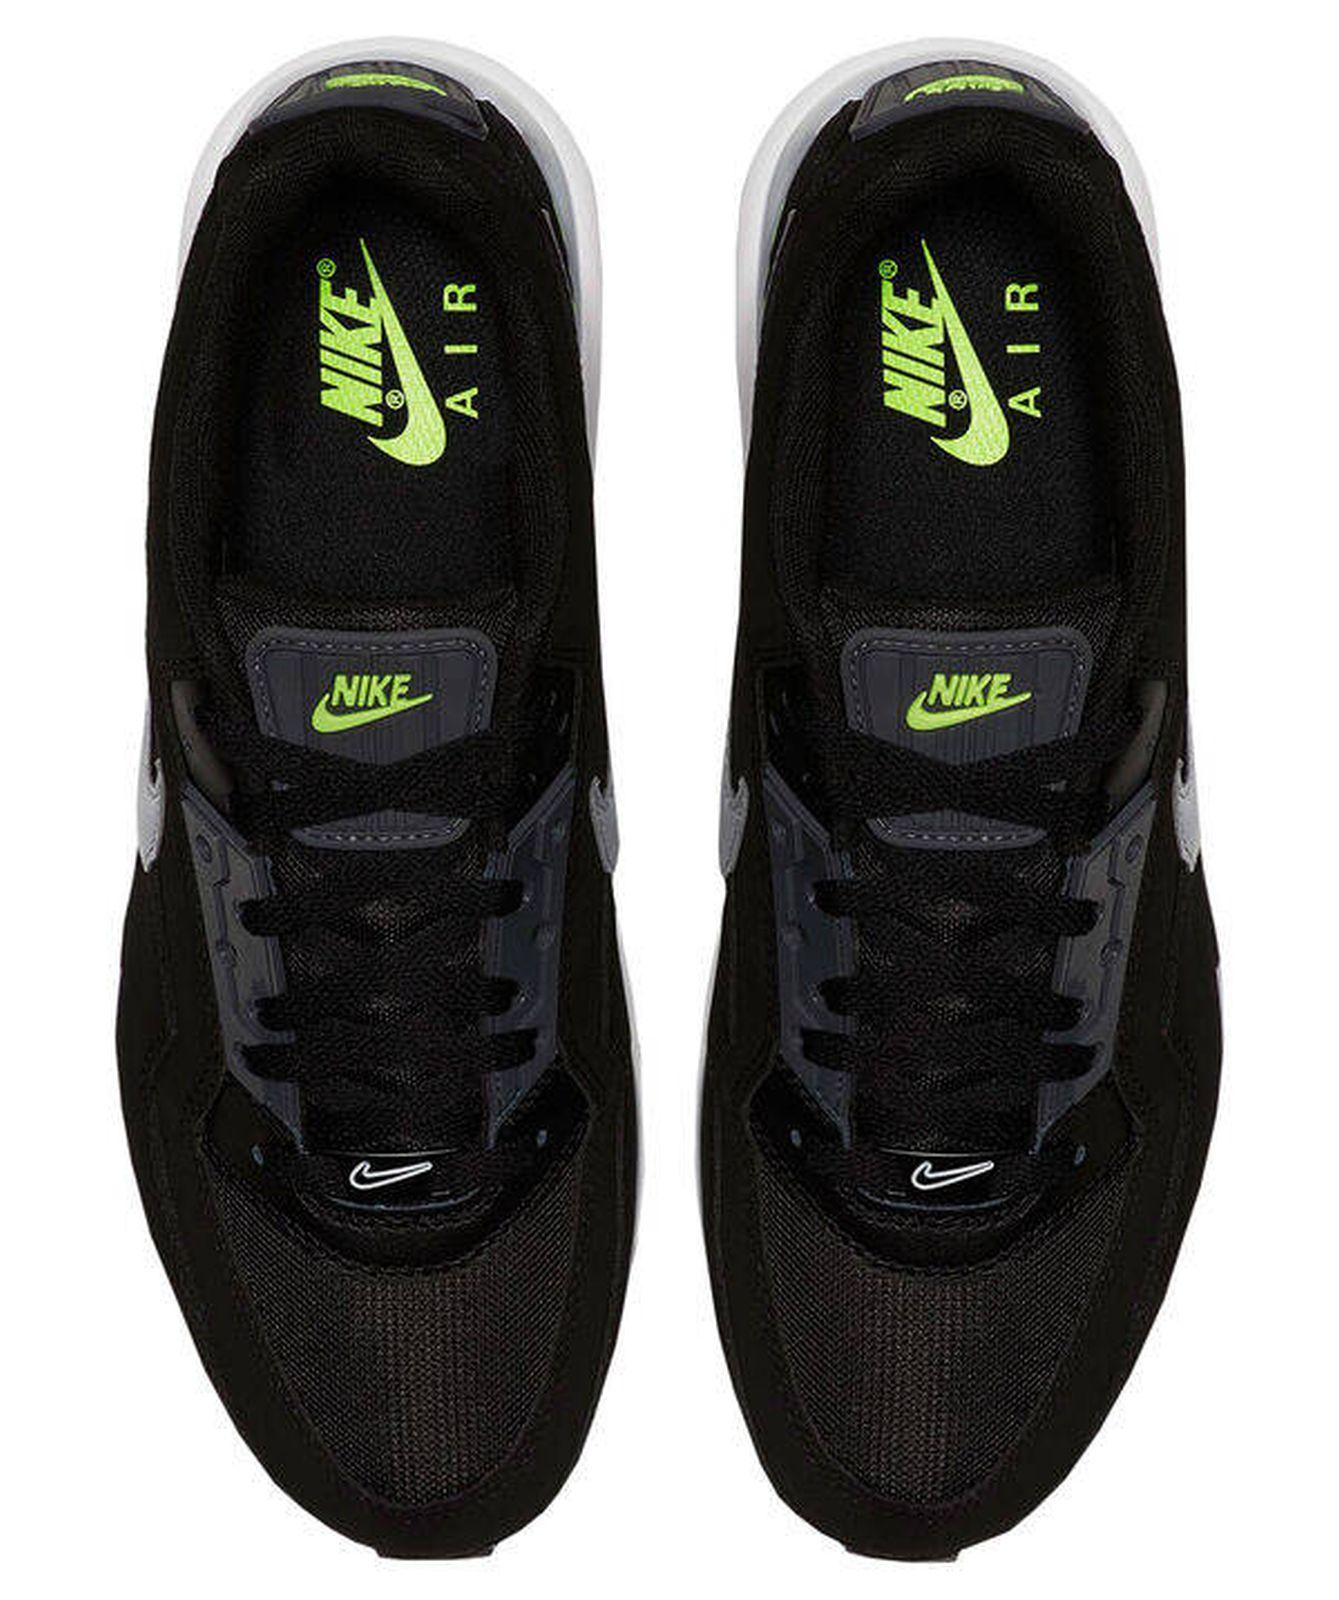 Details about Nike Herren Freizeiit Trend Schuhe Trainers Nike Air Max Ltd 3 Black CK0899